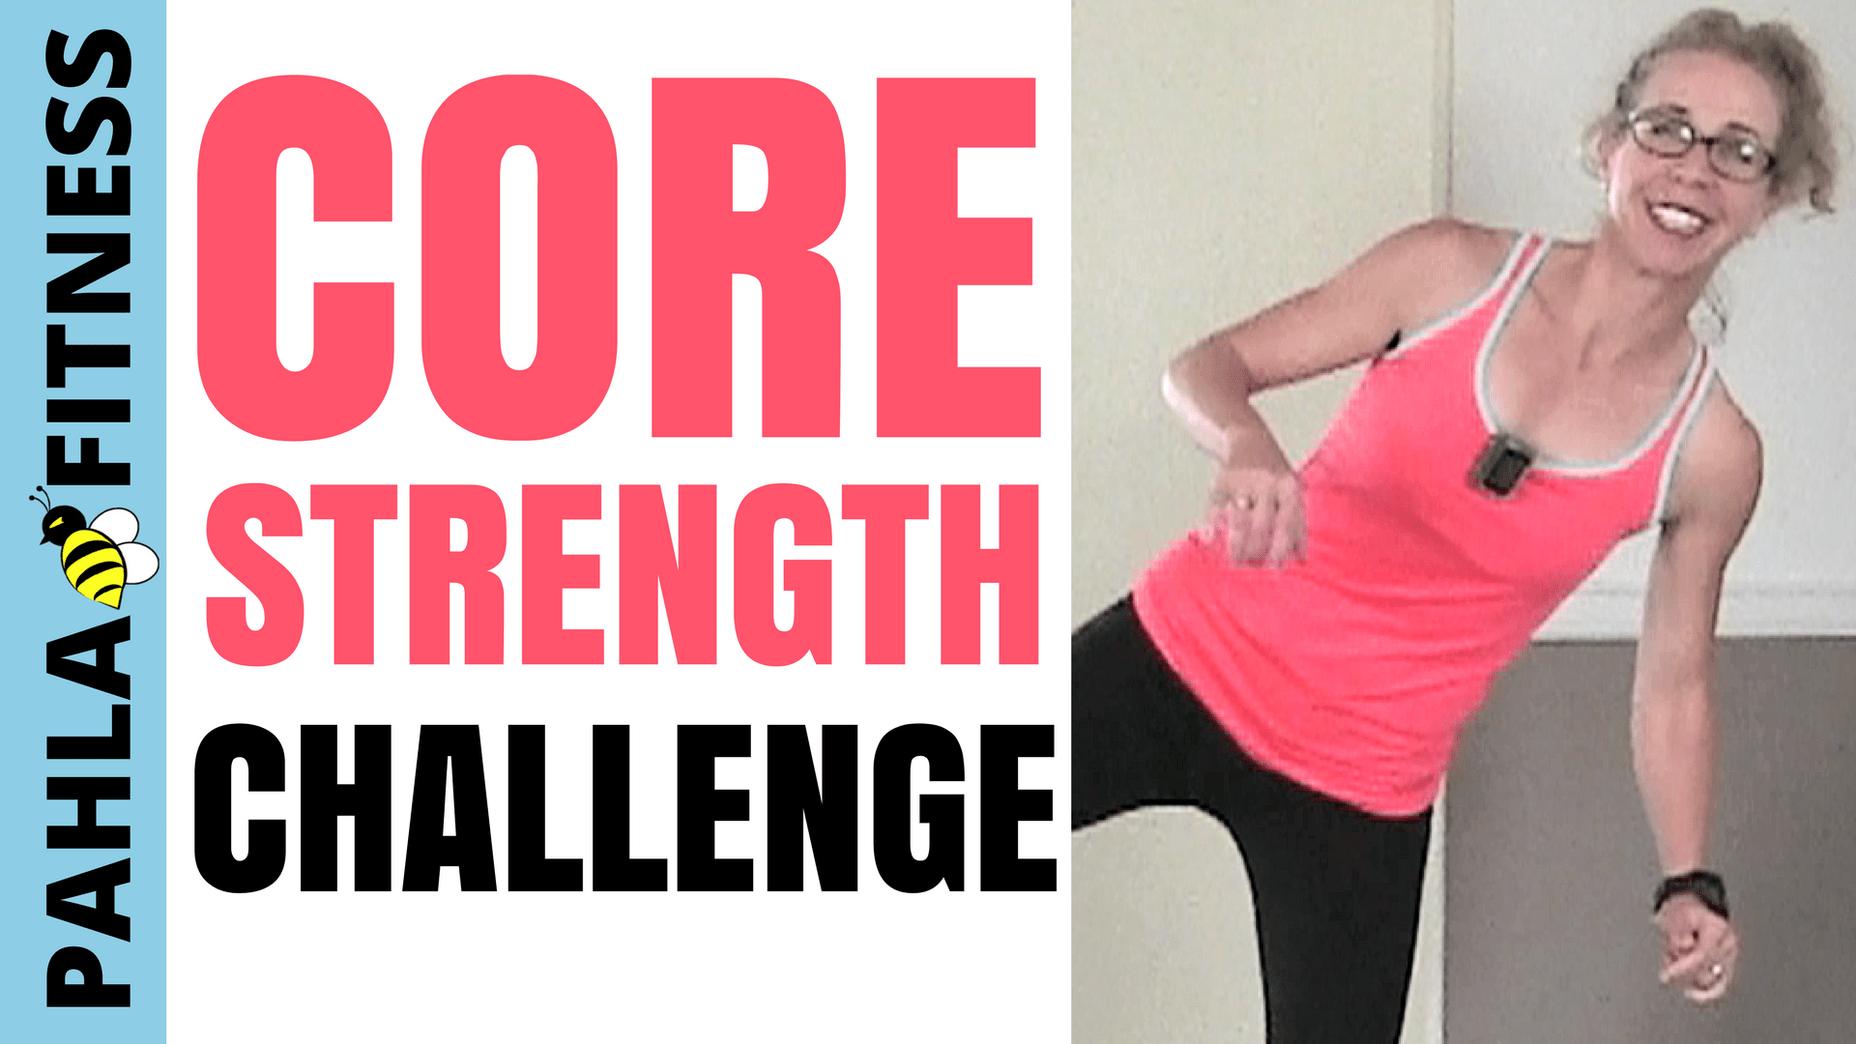 Coretober Challenge